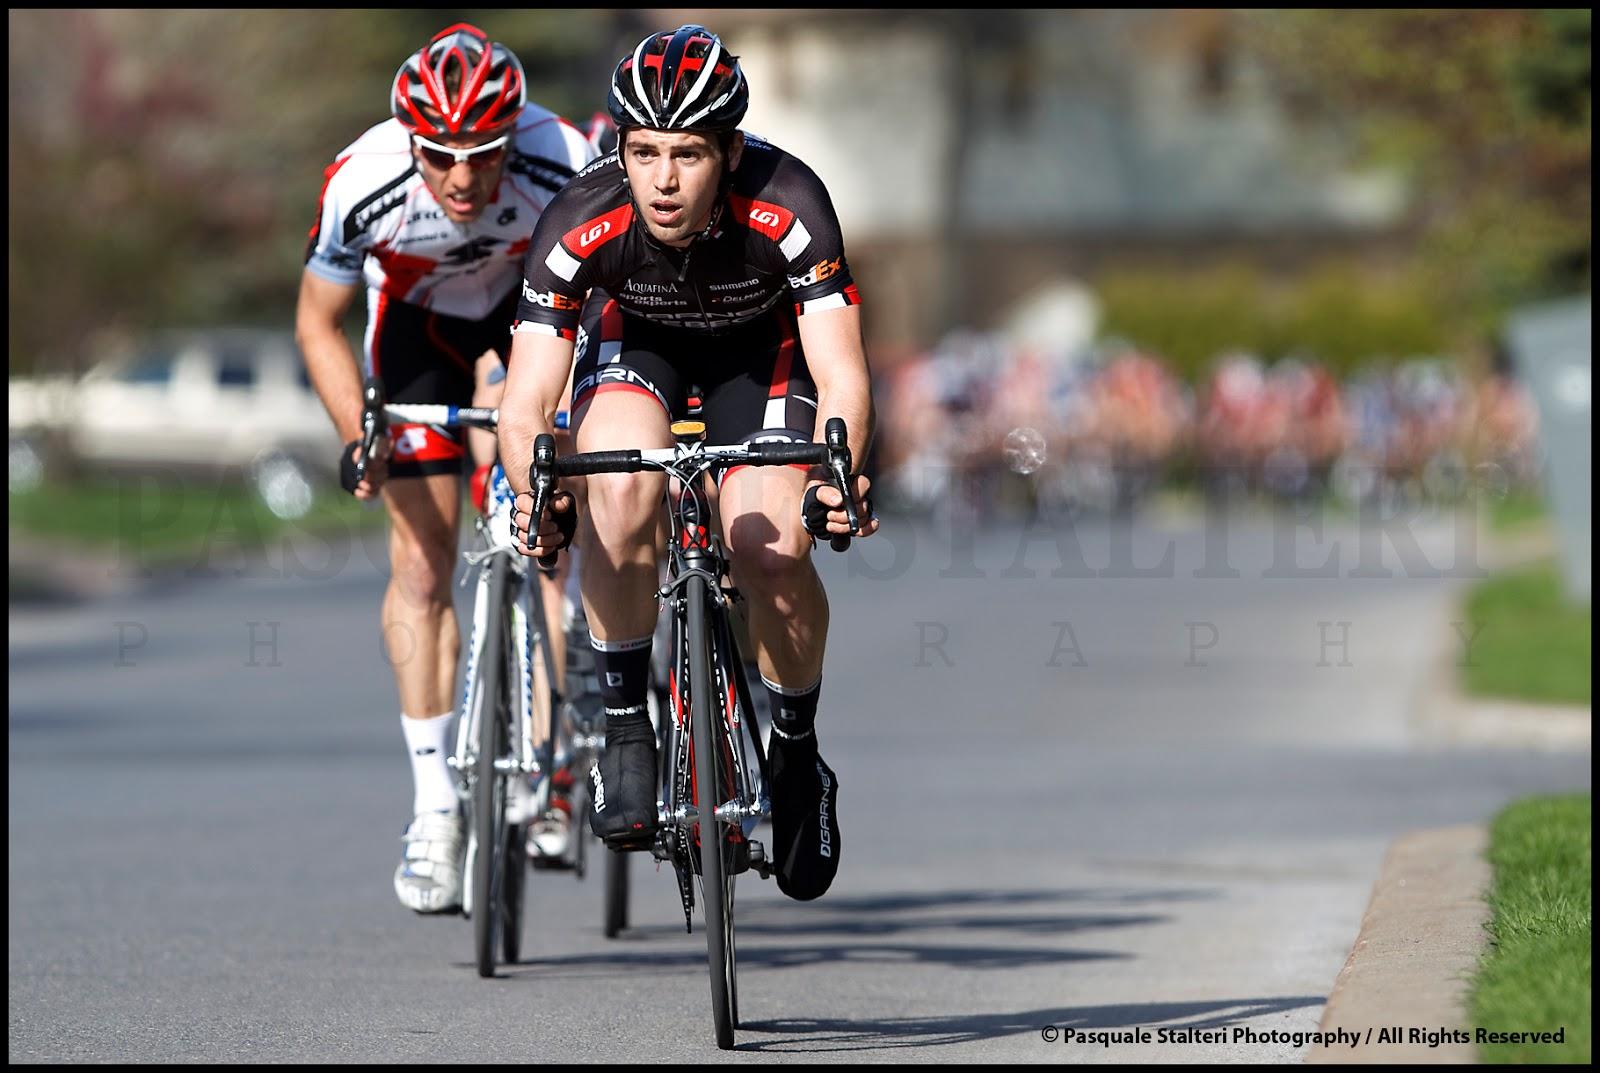 http://4.bp.blogspot.com/-JkQaH_0tz4U/T617vR-RlxI/AAAAAAAAROQ/YsmnX0l1B-A/s1600/Remi+Pelletier-Roy_Miroir+du+Cyclisme_Pasquale+Stalteri_PAS2970.jpg